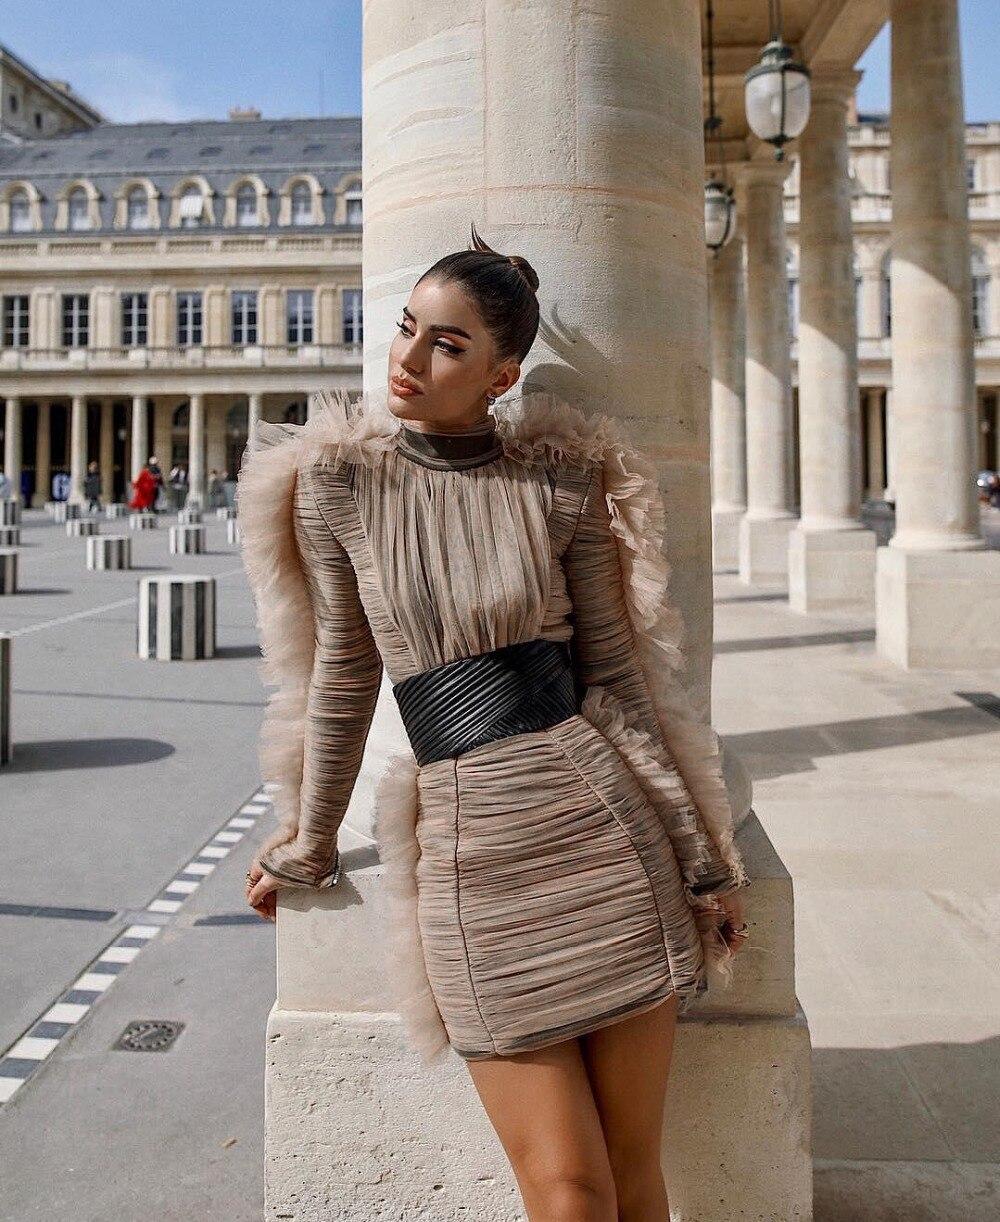 Khaki Farbe Nach Maß Material Lange Hülse Chiffon Bodycon Mini Kleid Mit Gürtel Fashion Runway Modell Abend Party Kleid